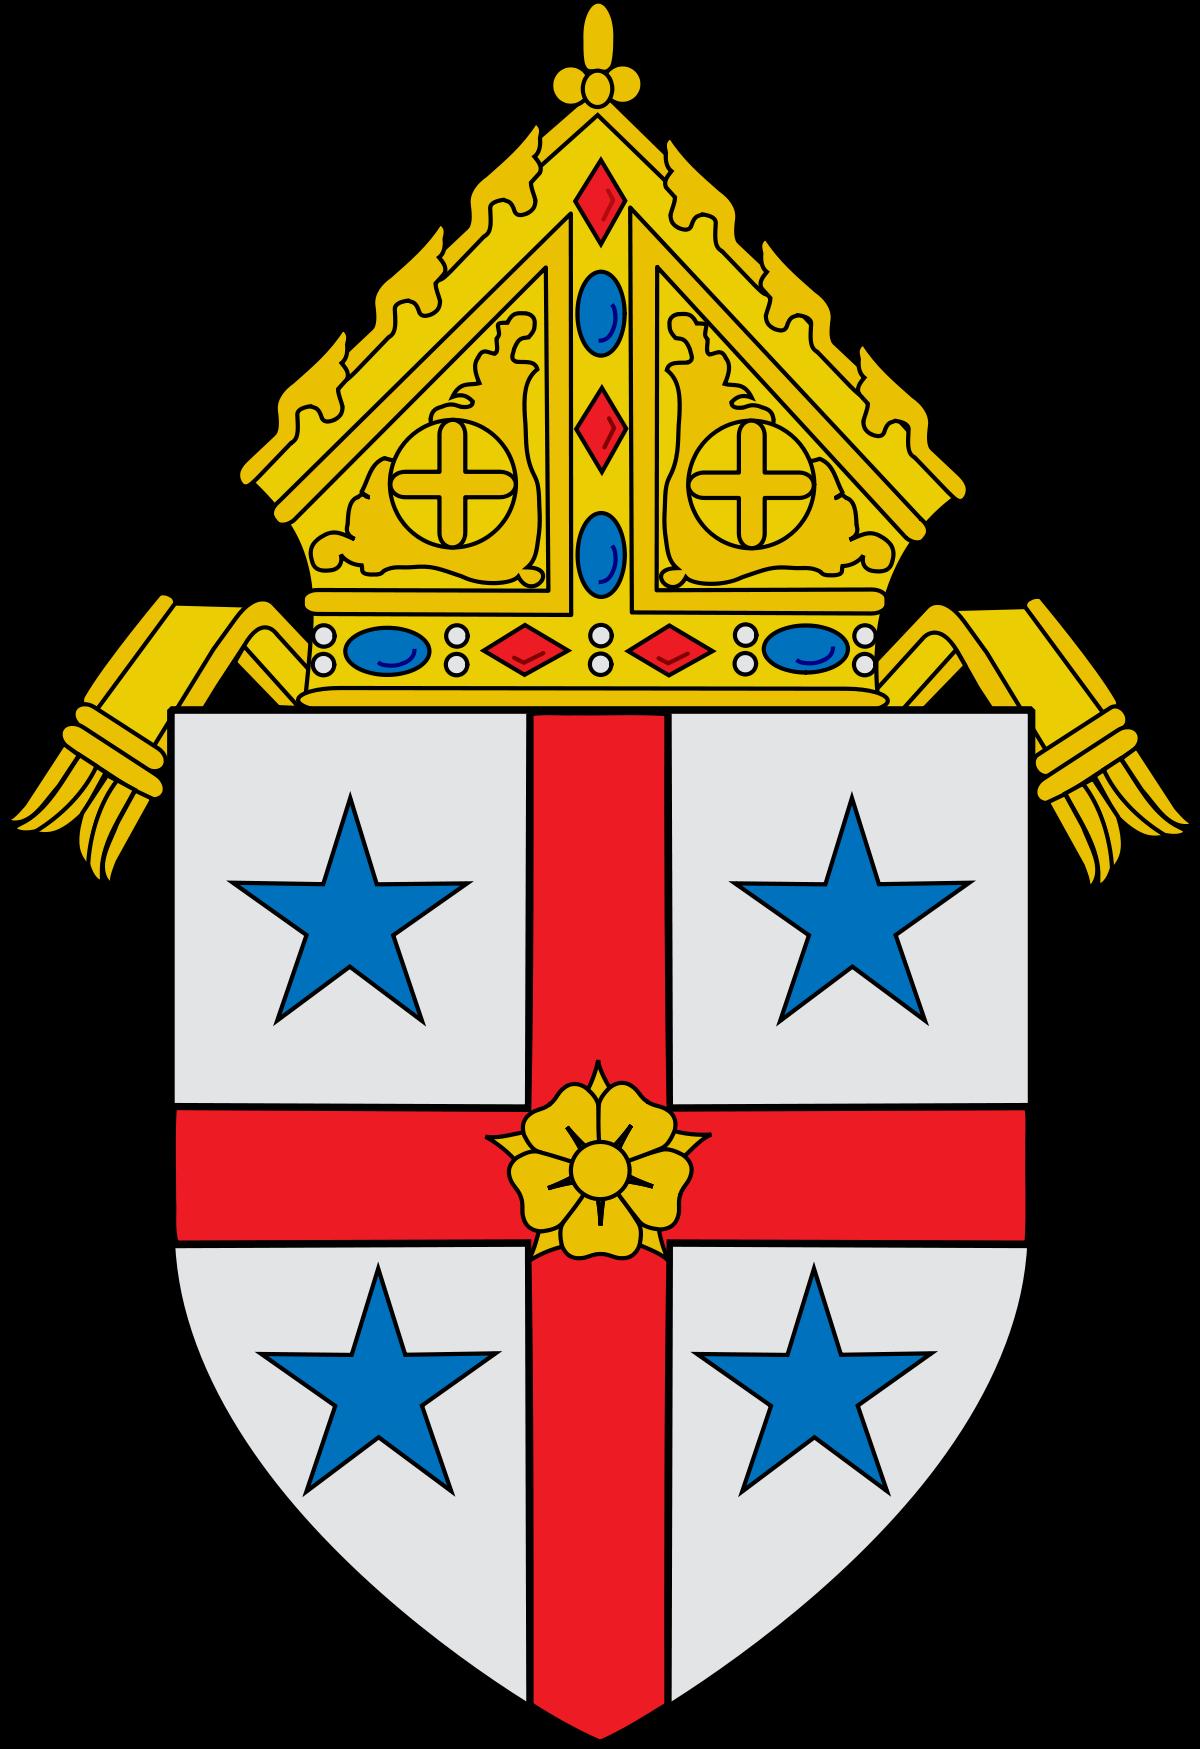 Roman diocese of savannah. Pastor clipart catholic community